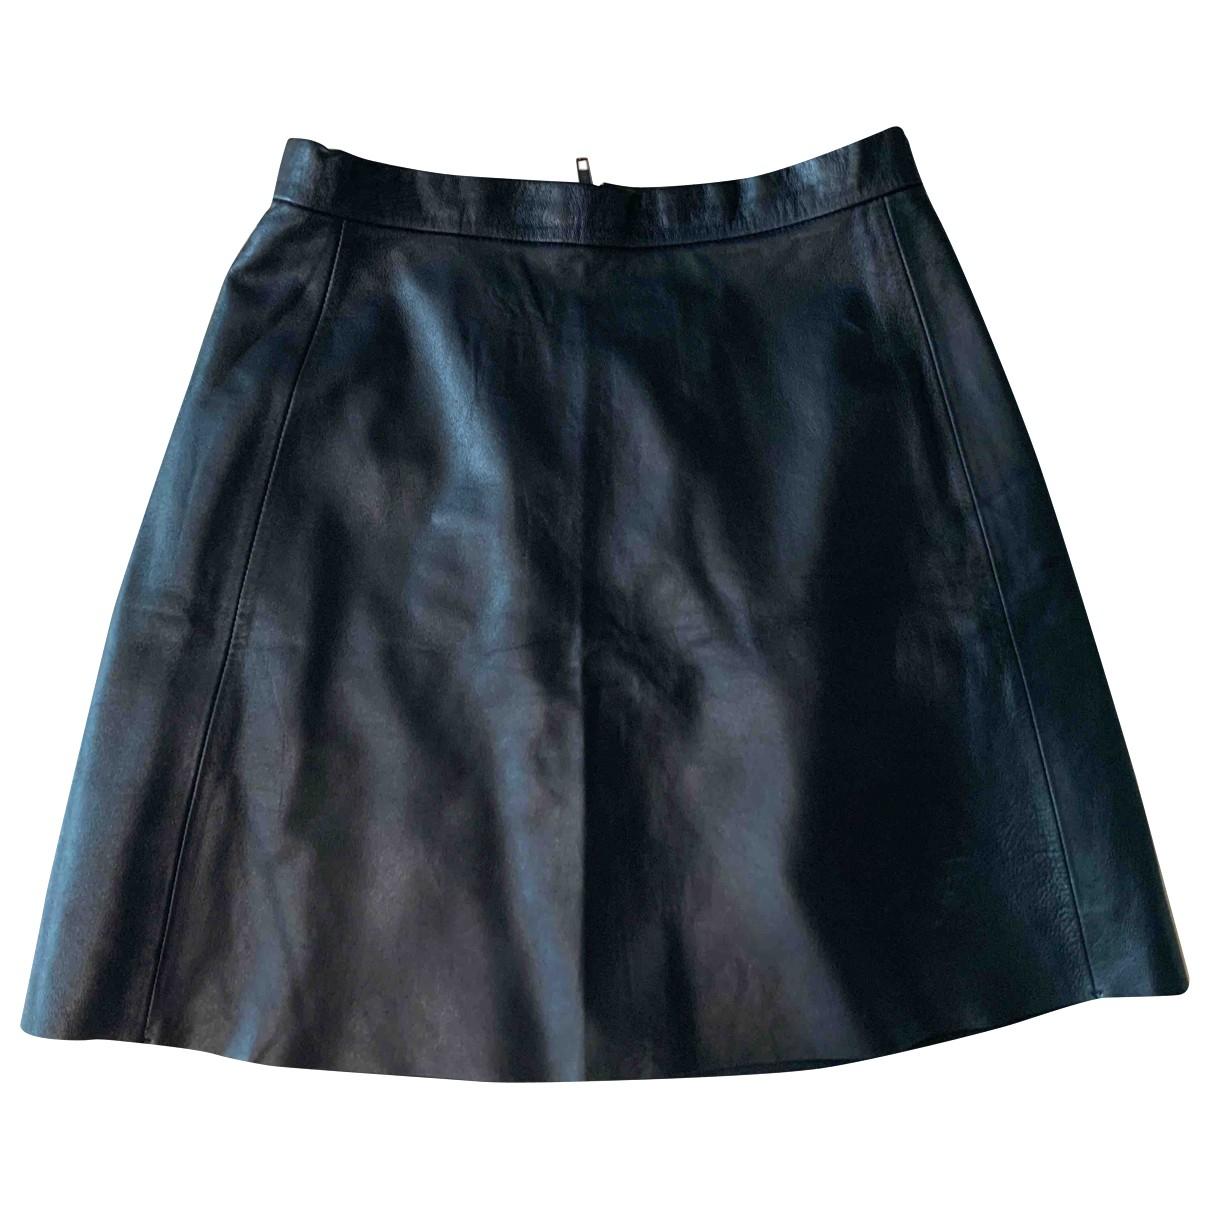 Muubaa - Jupe   pour femme en cuir - noir